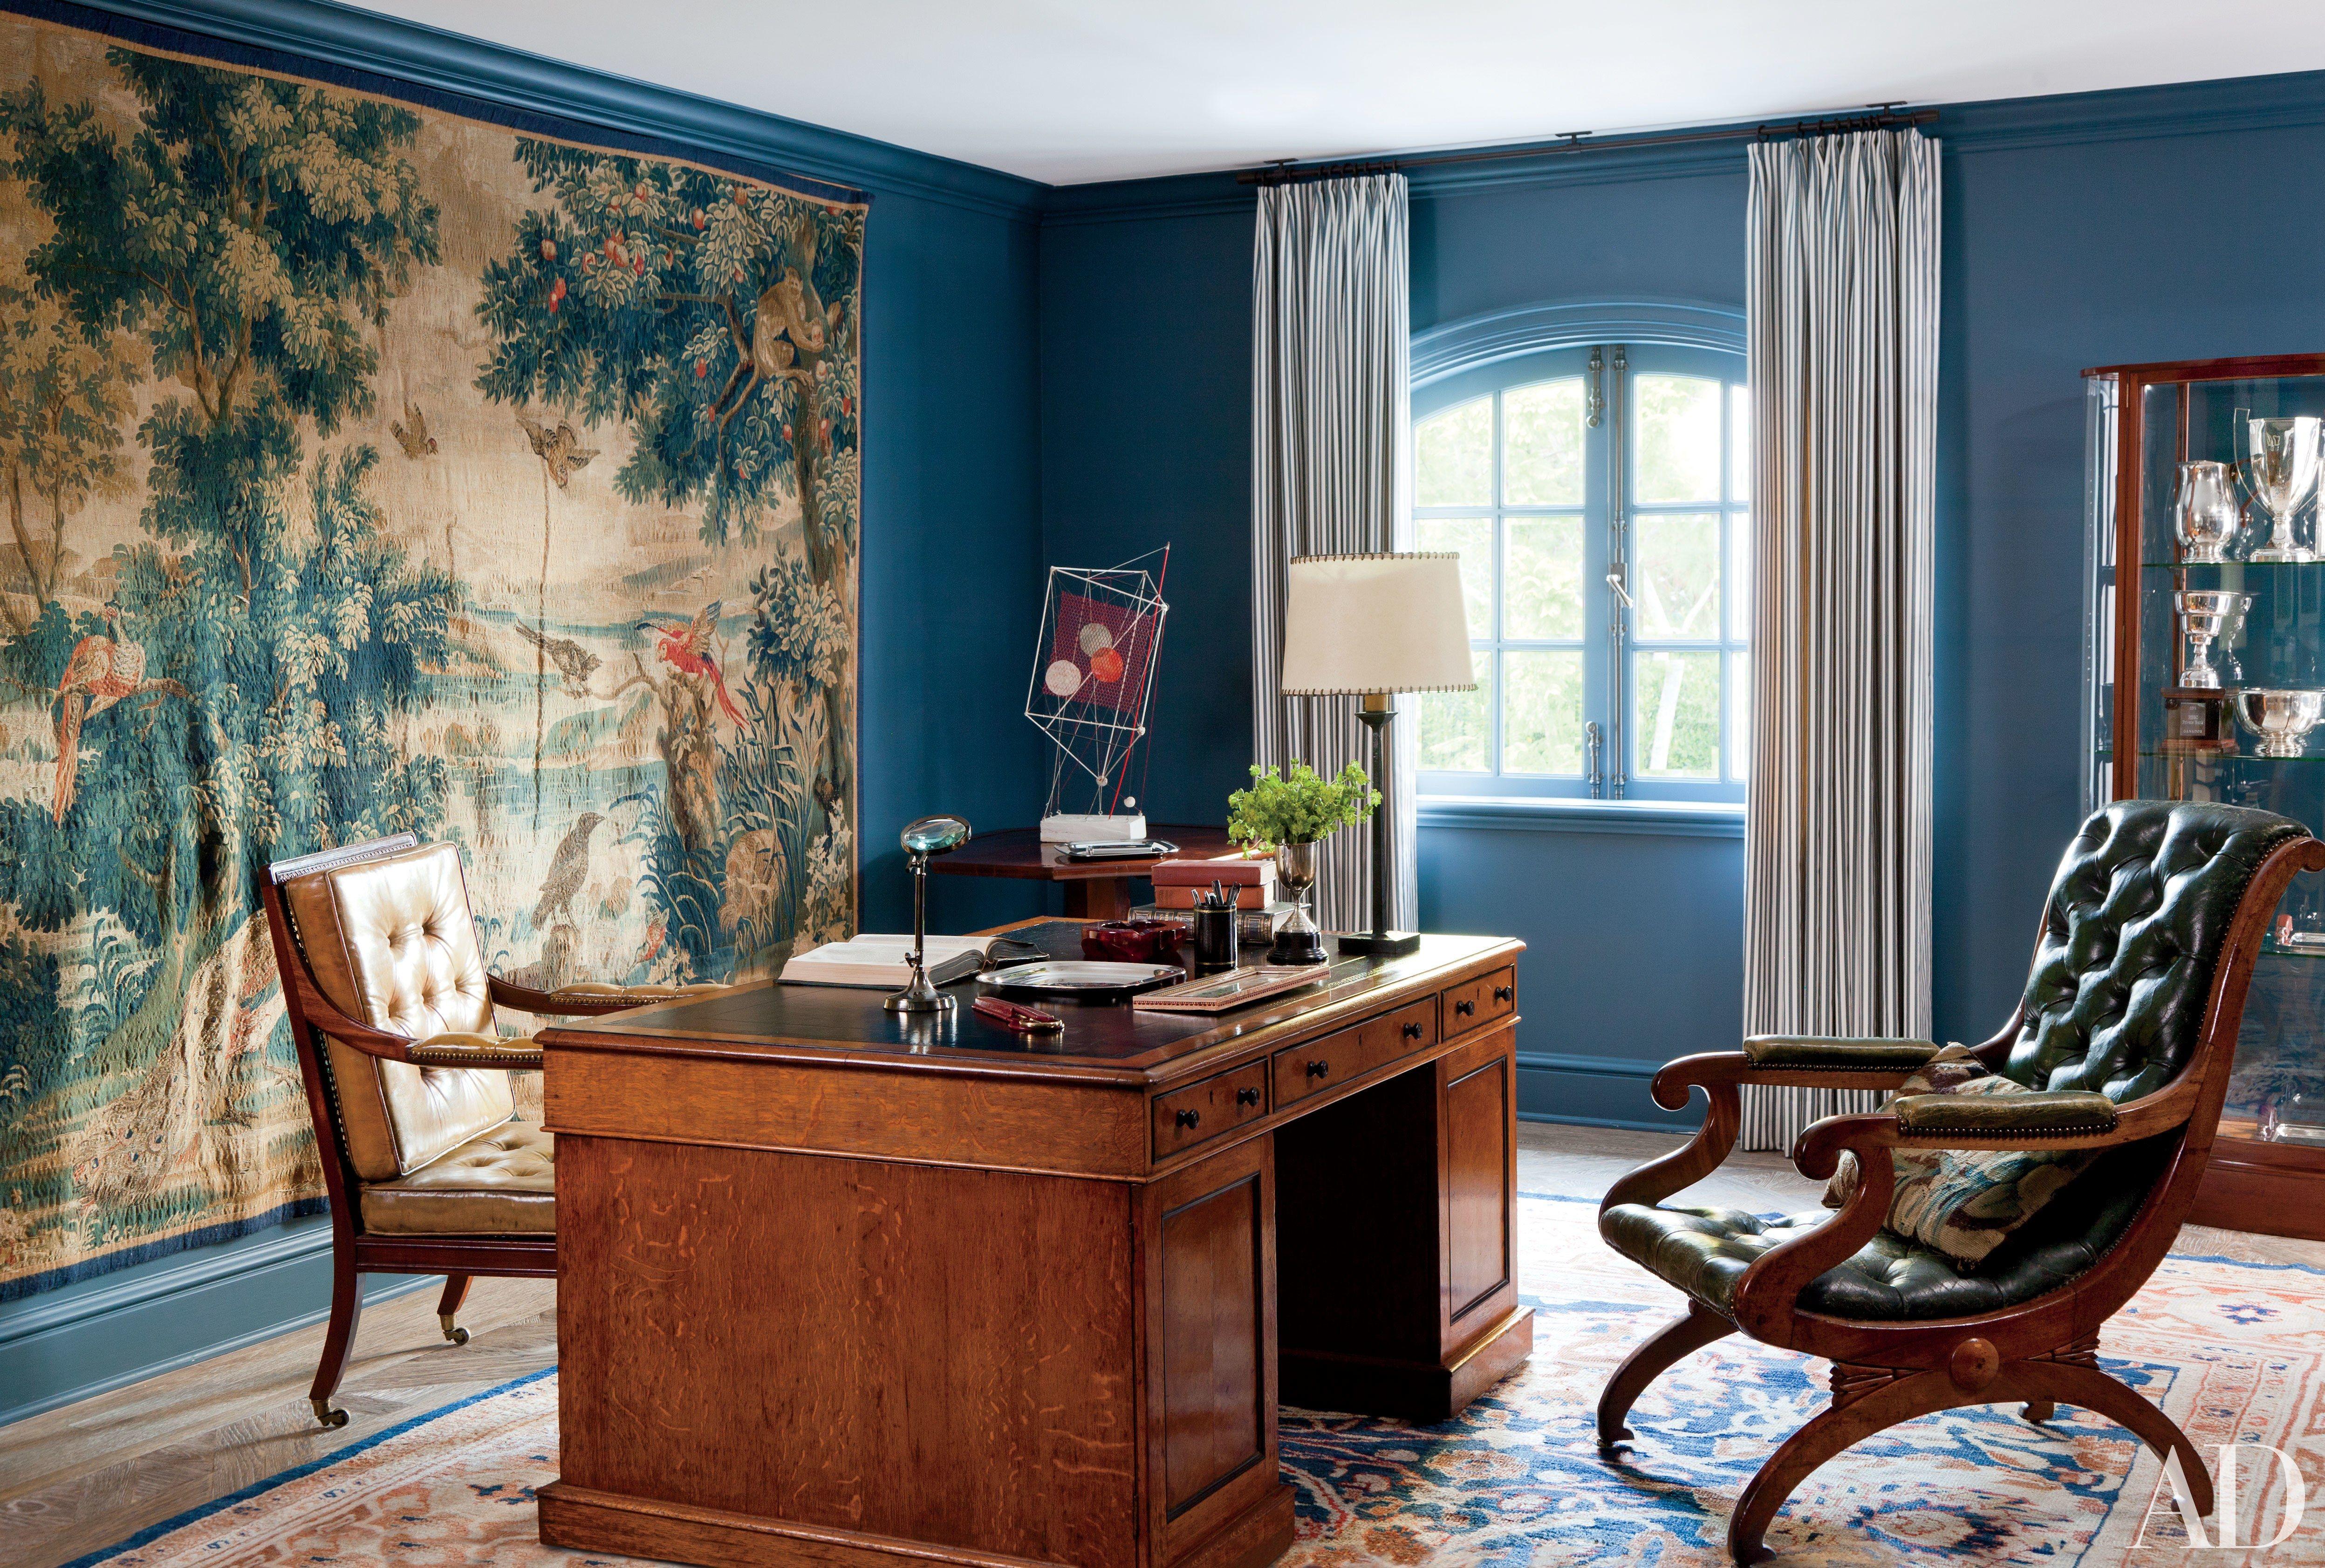 10 bureaux o l 39 on r ve de travailler pinterest. Black Bedroom Furniture Sets. Home Design Ideas